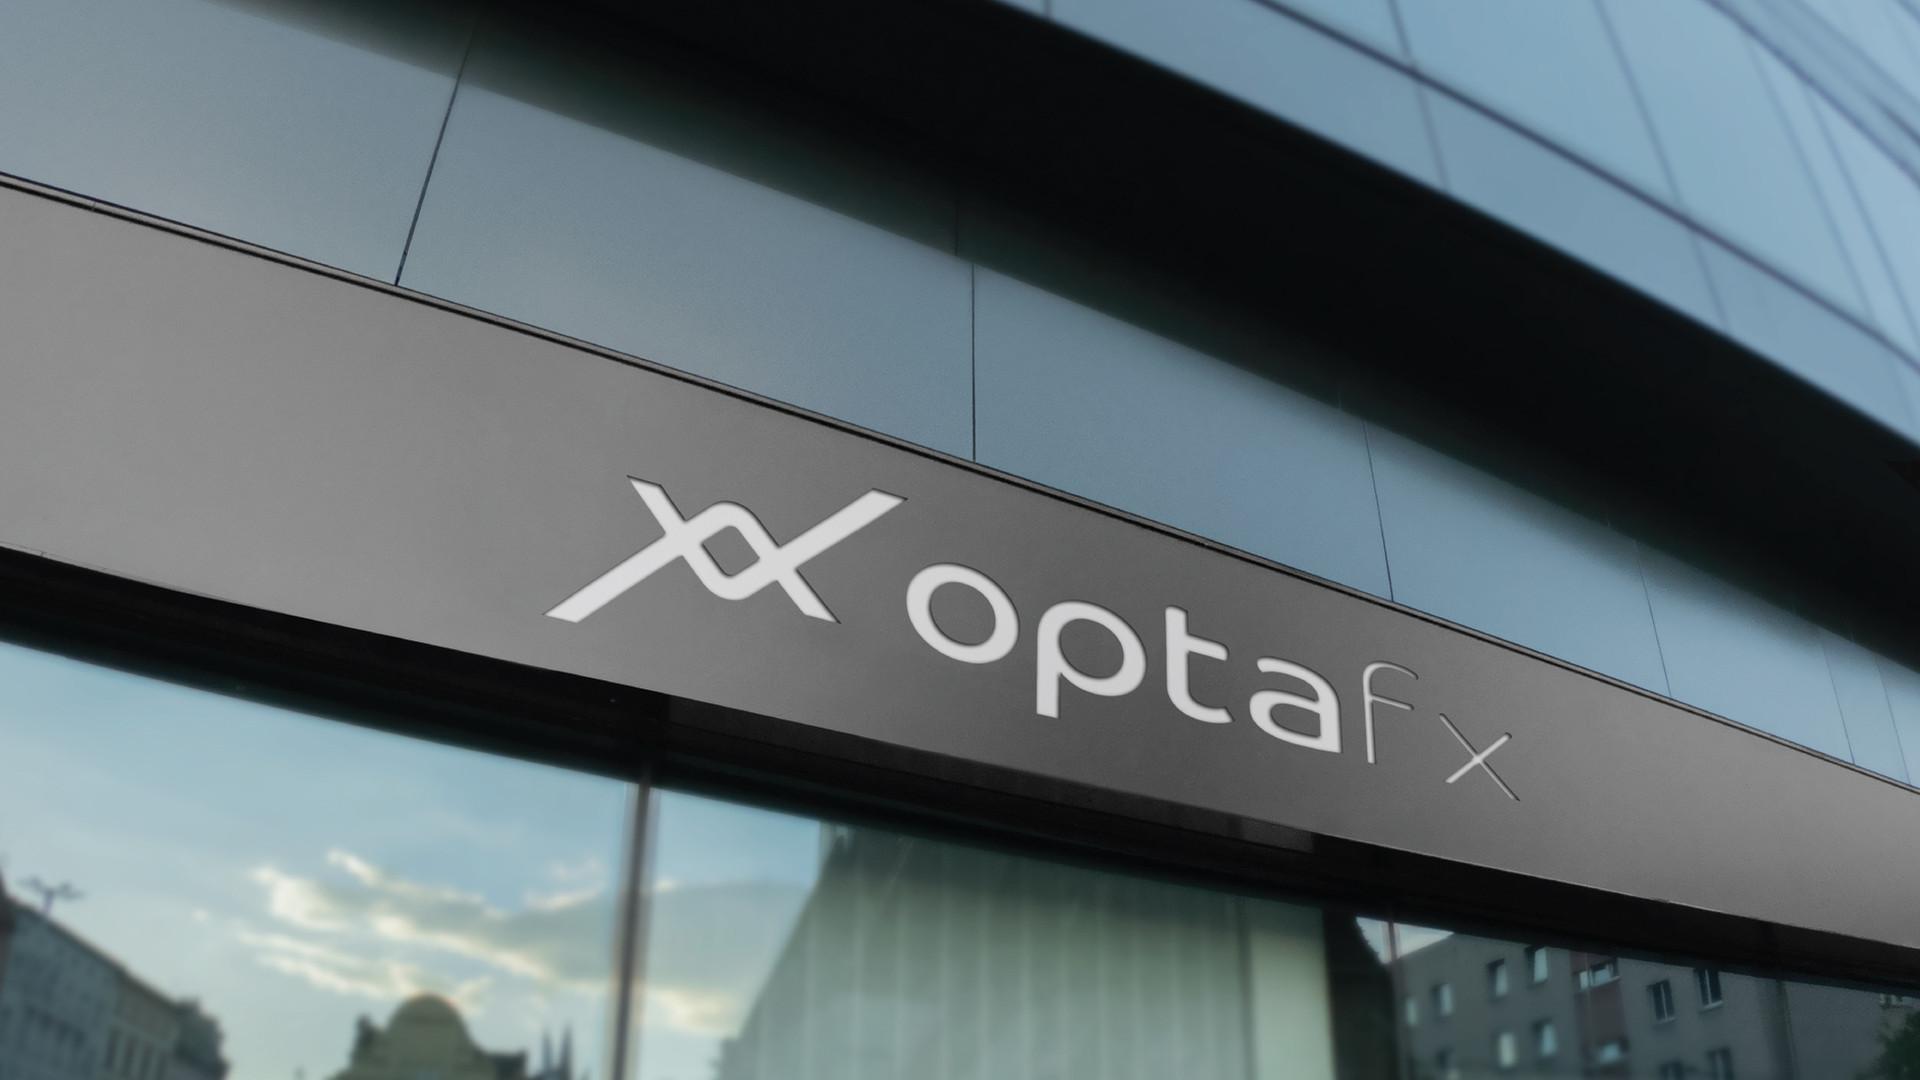 img-portfolio-optafx-voadora (3).jpg